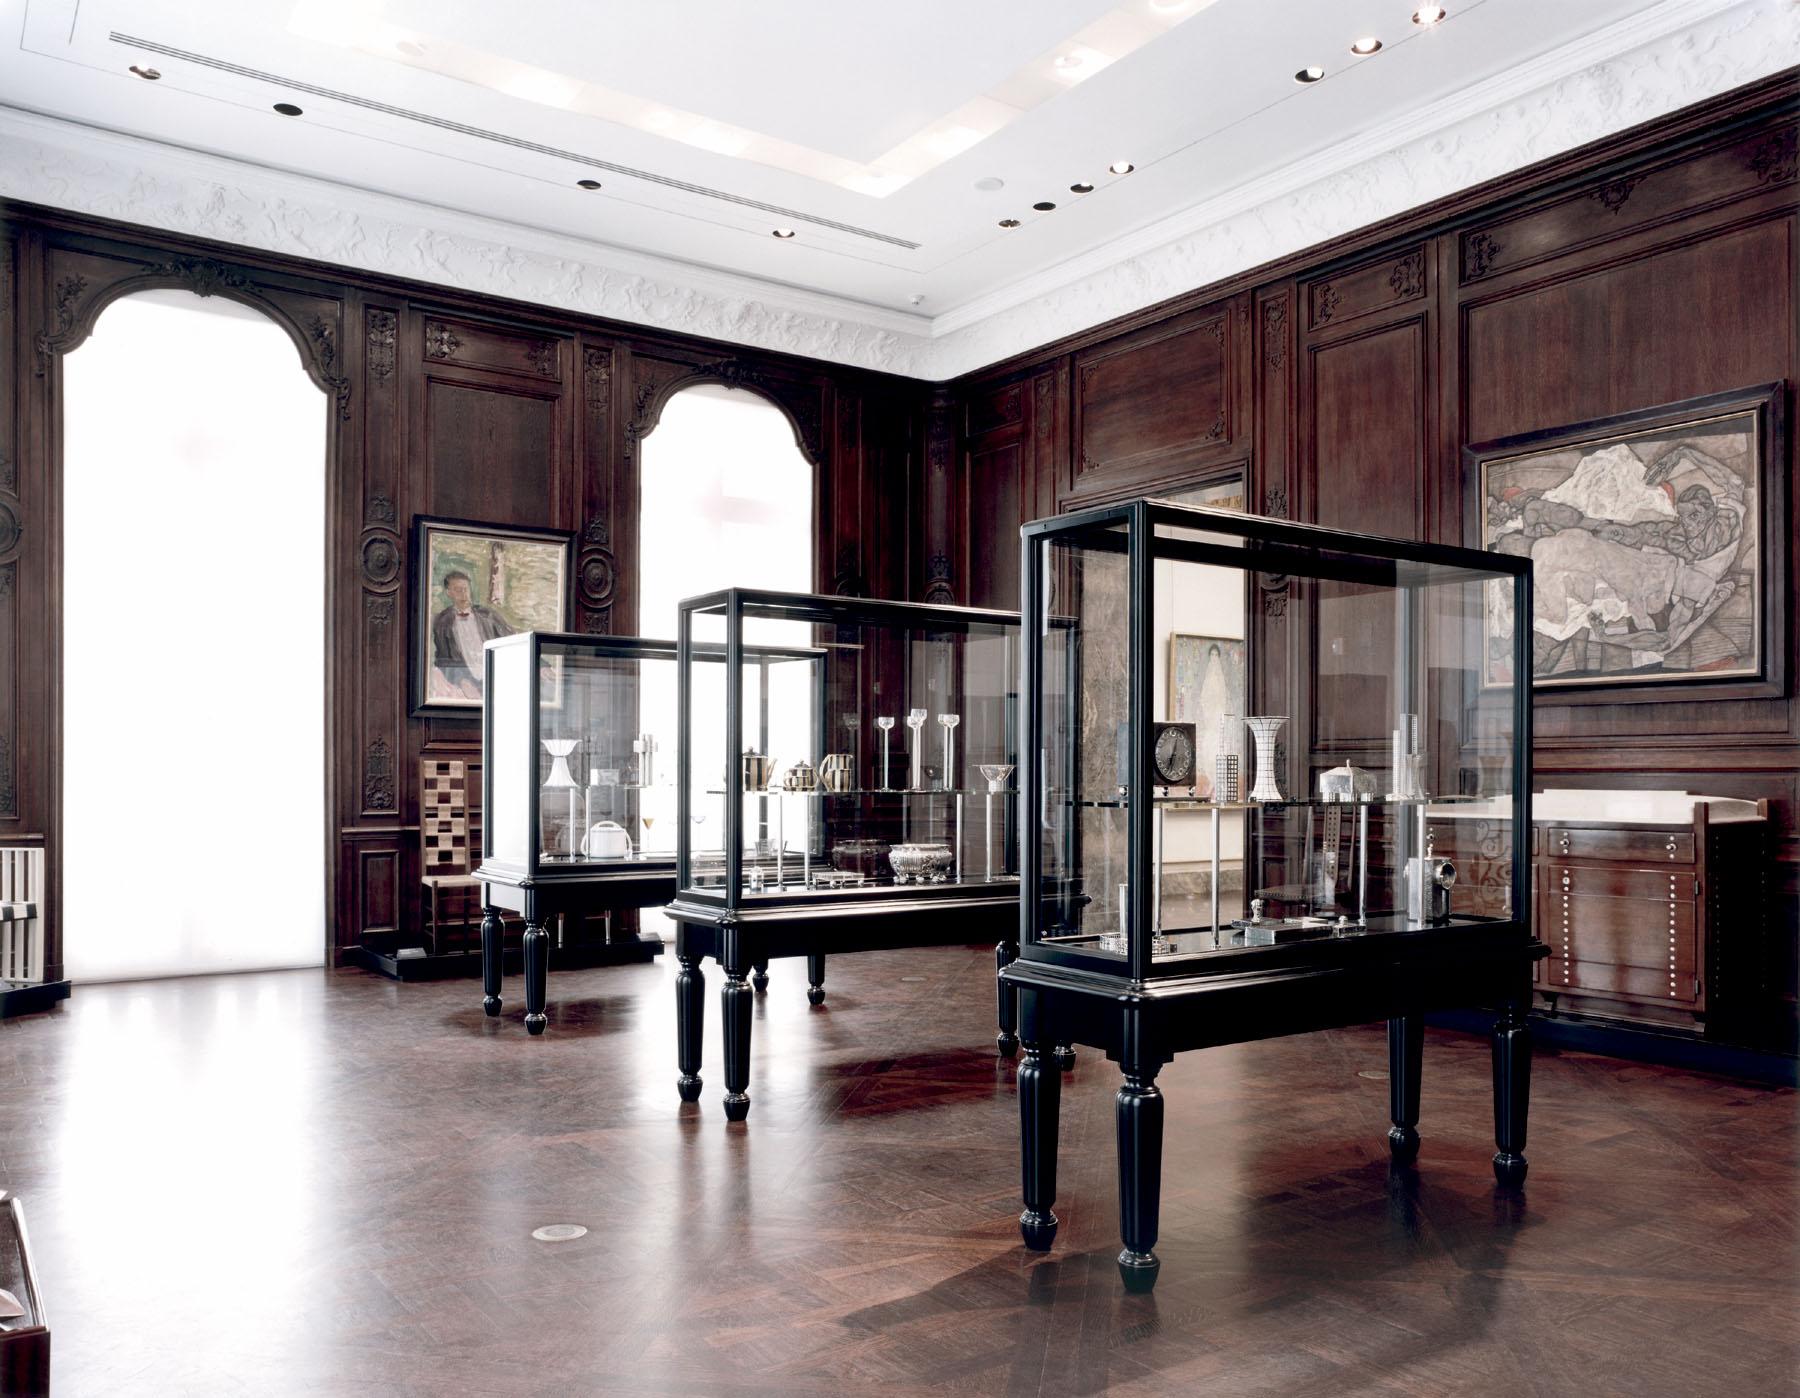 Neue Galerie New York - Selldorf Architects - New York